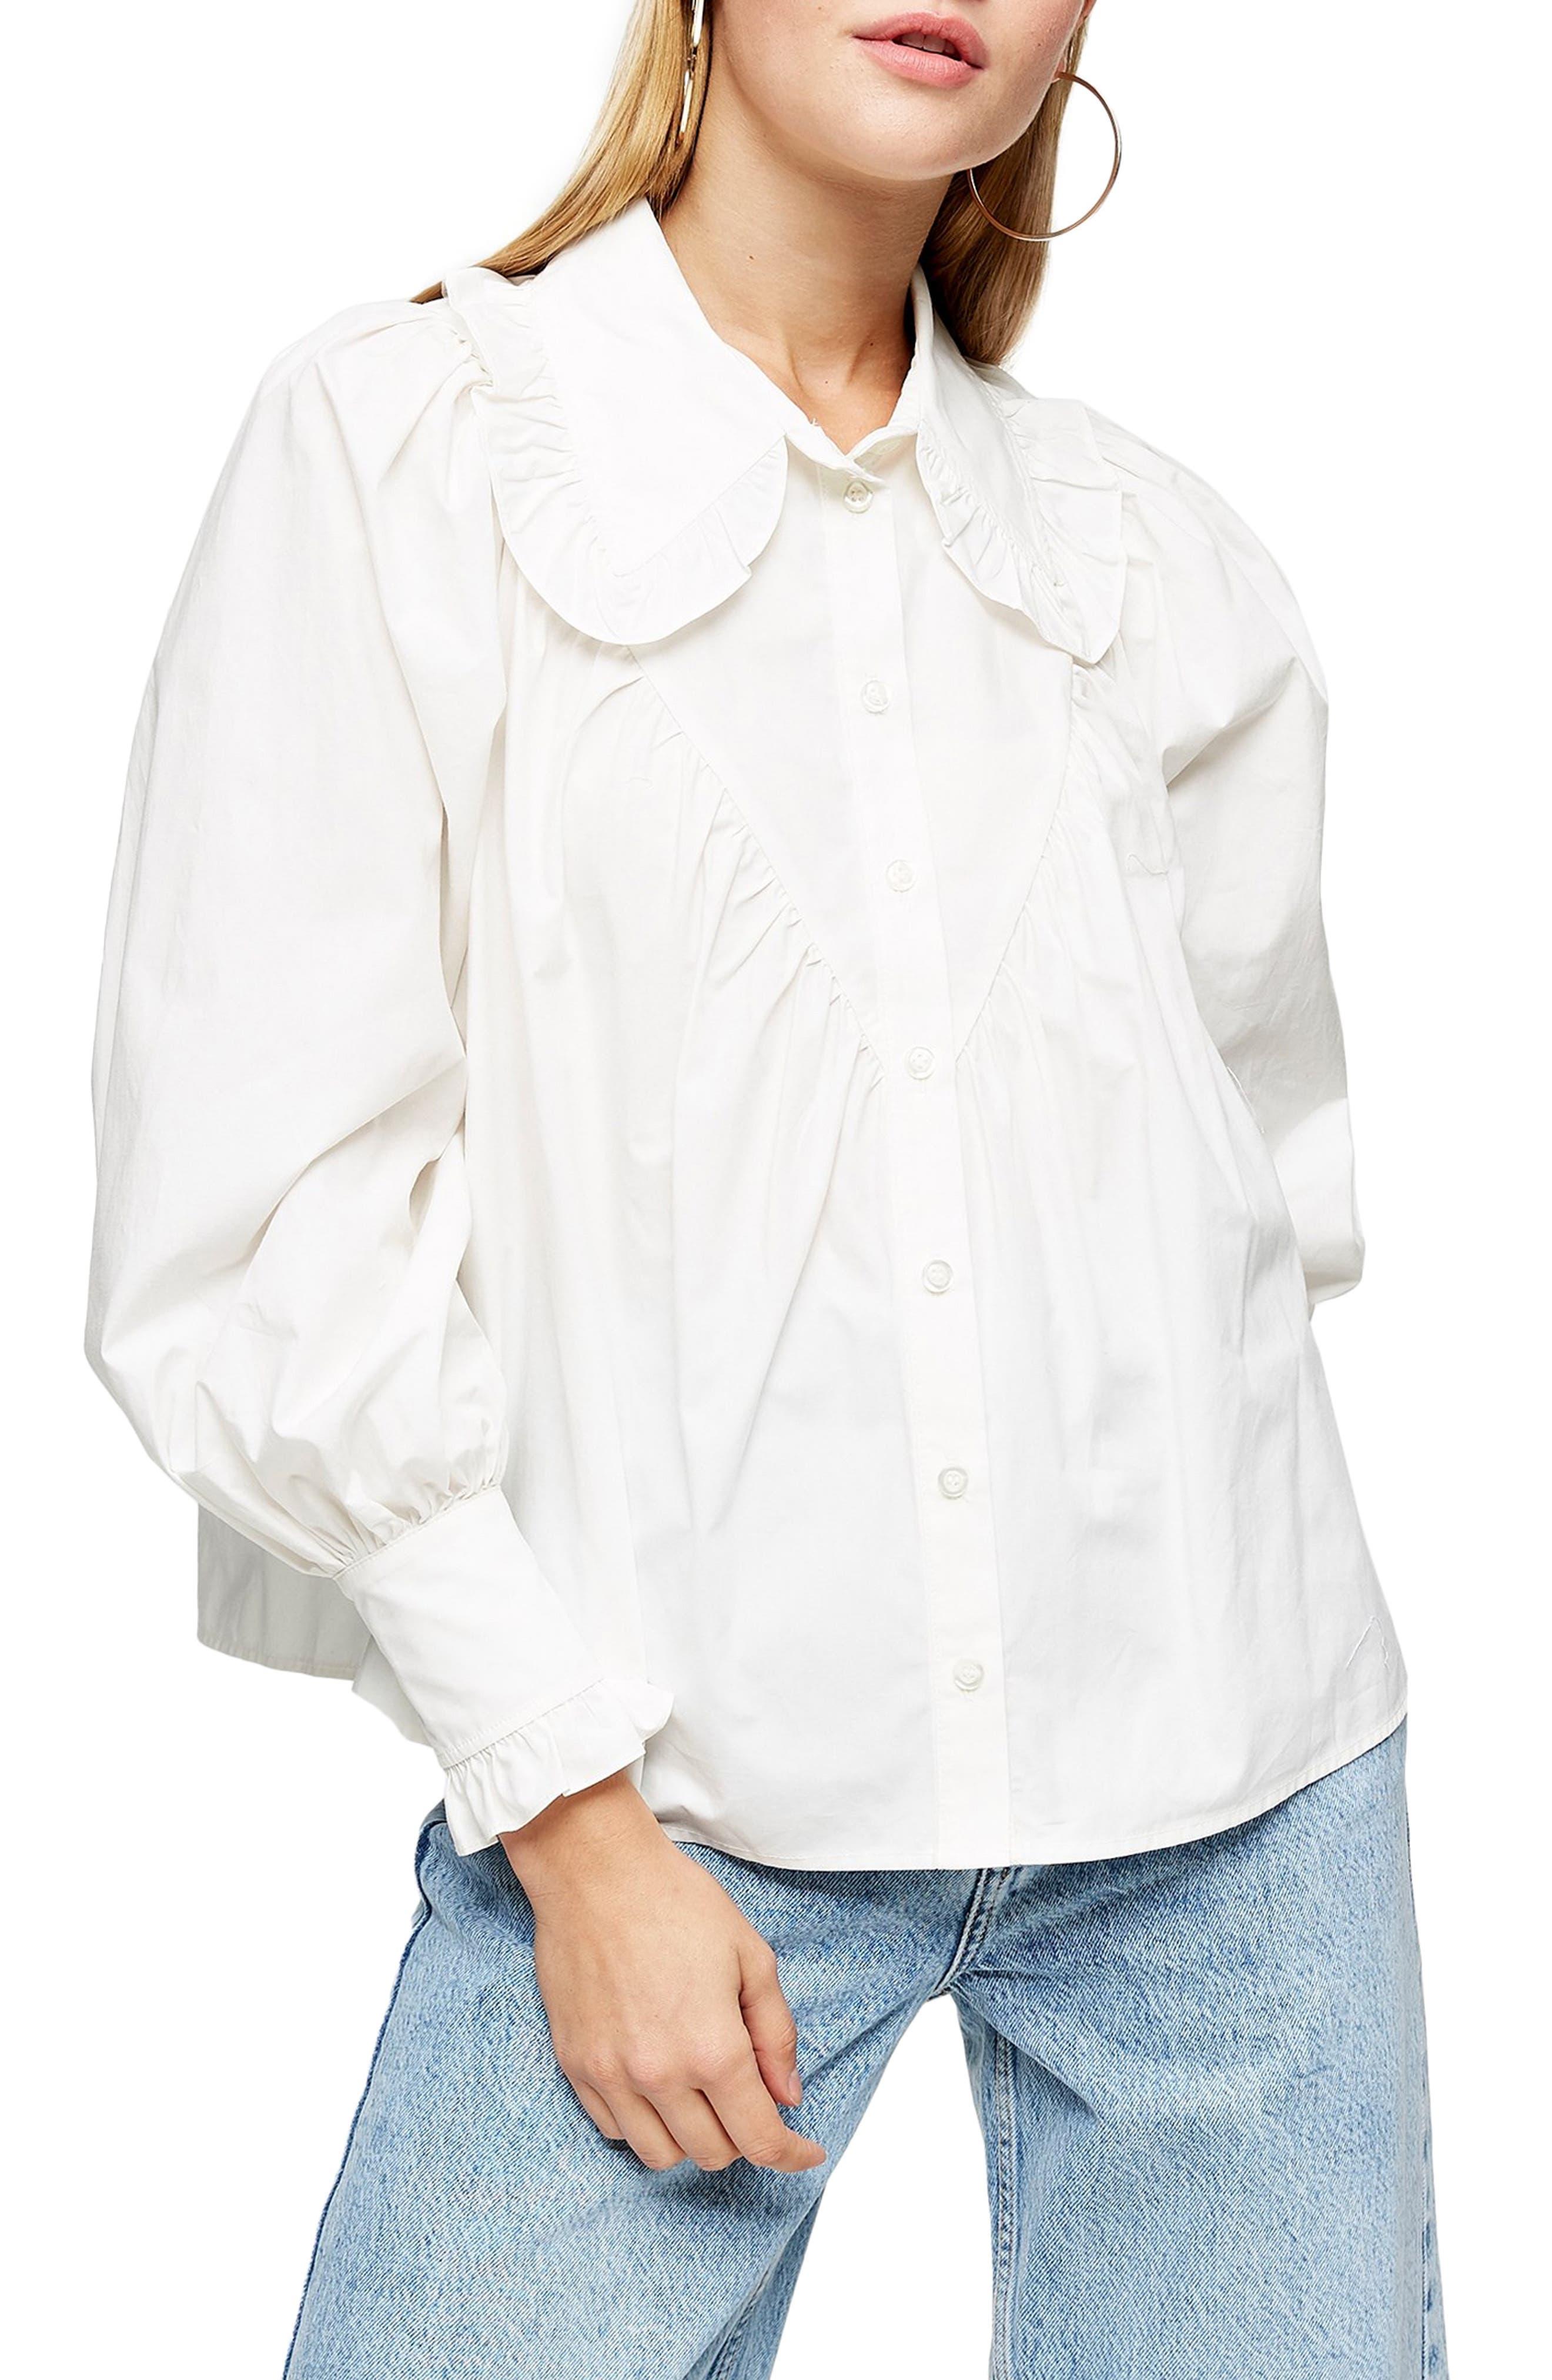 Edwardian Blouses | White & Black Lace Blouses & Sweaters Womens Topshop Ruffle Collar Poplin Blouse $58.00 AT vintagedancer.com